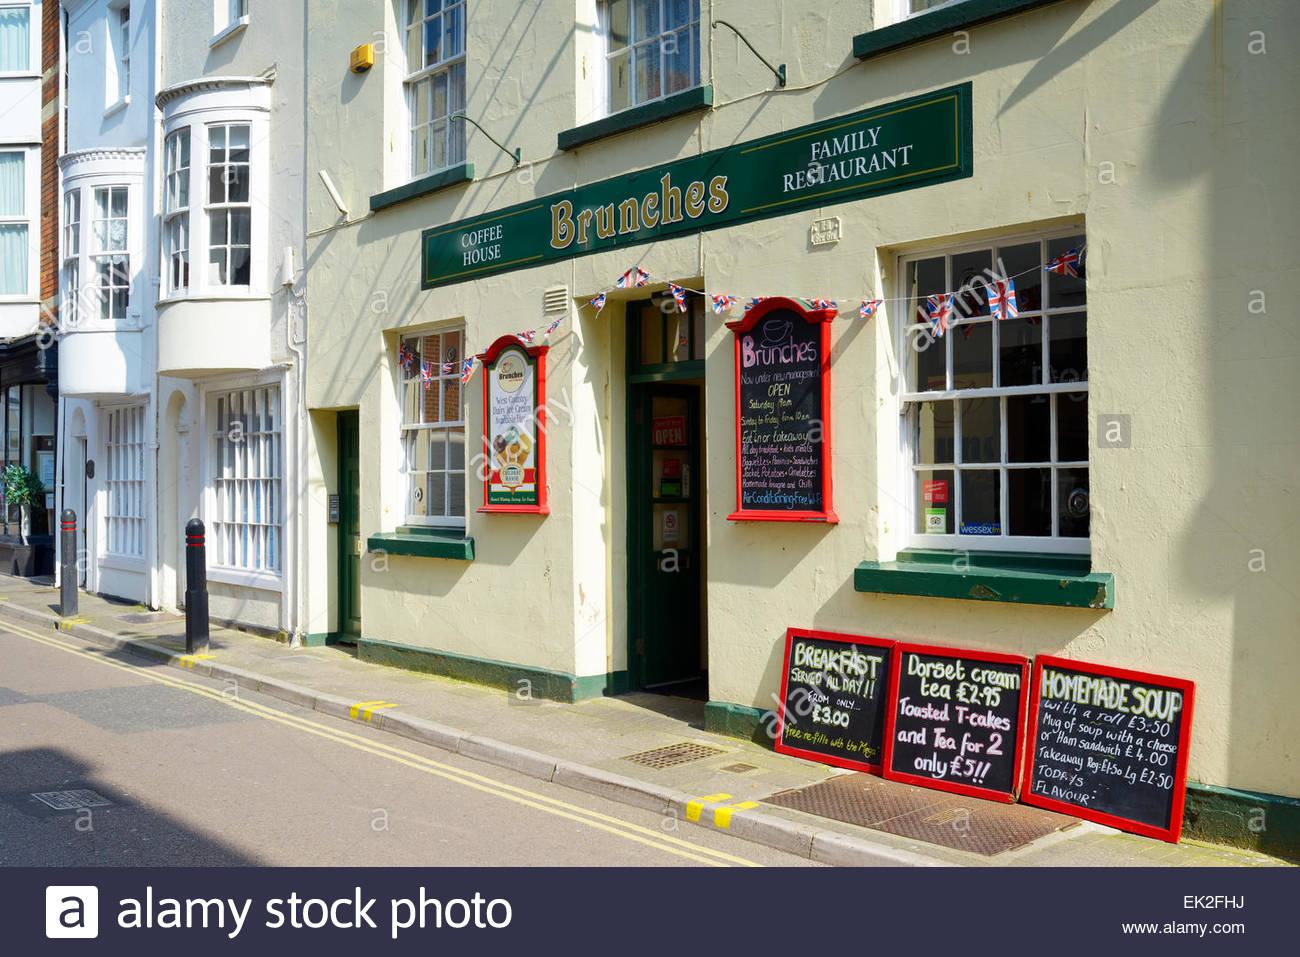 Brunches cafe, Maiden Street, Weymouth, Dorset, England UK - Stock Image